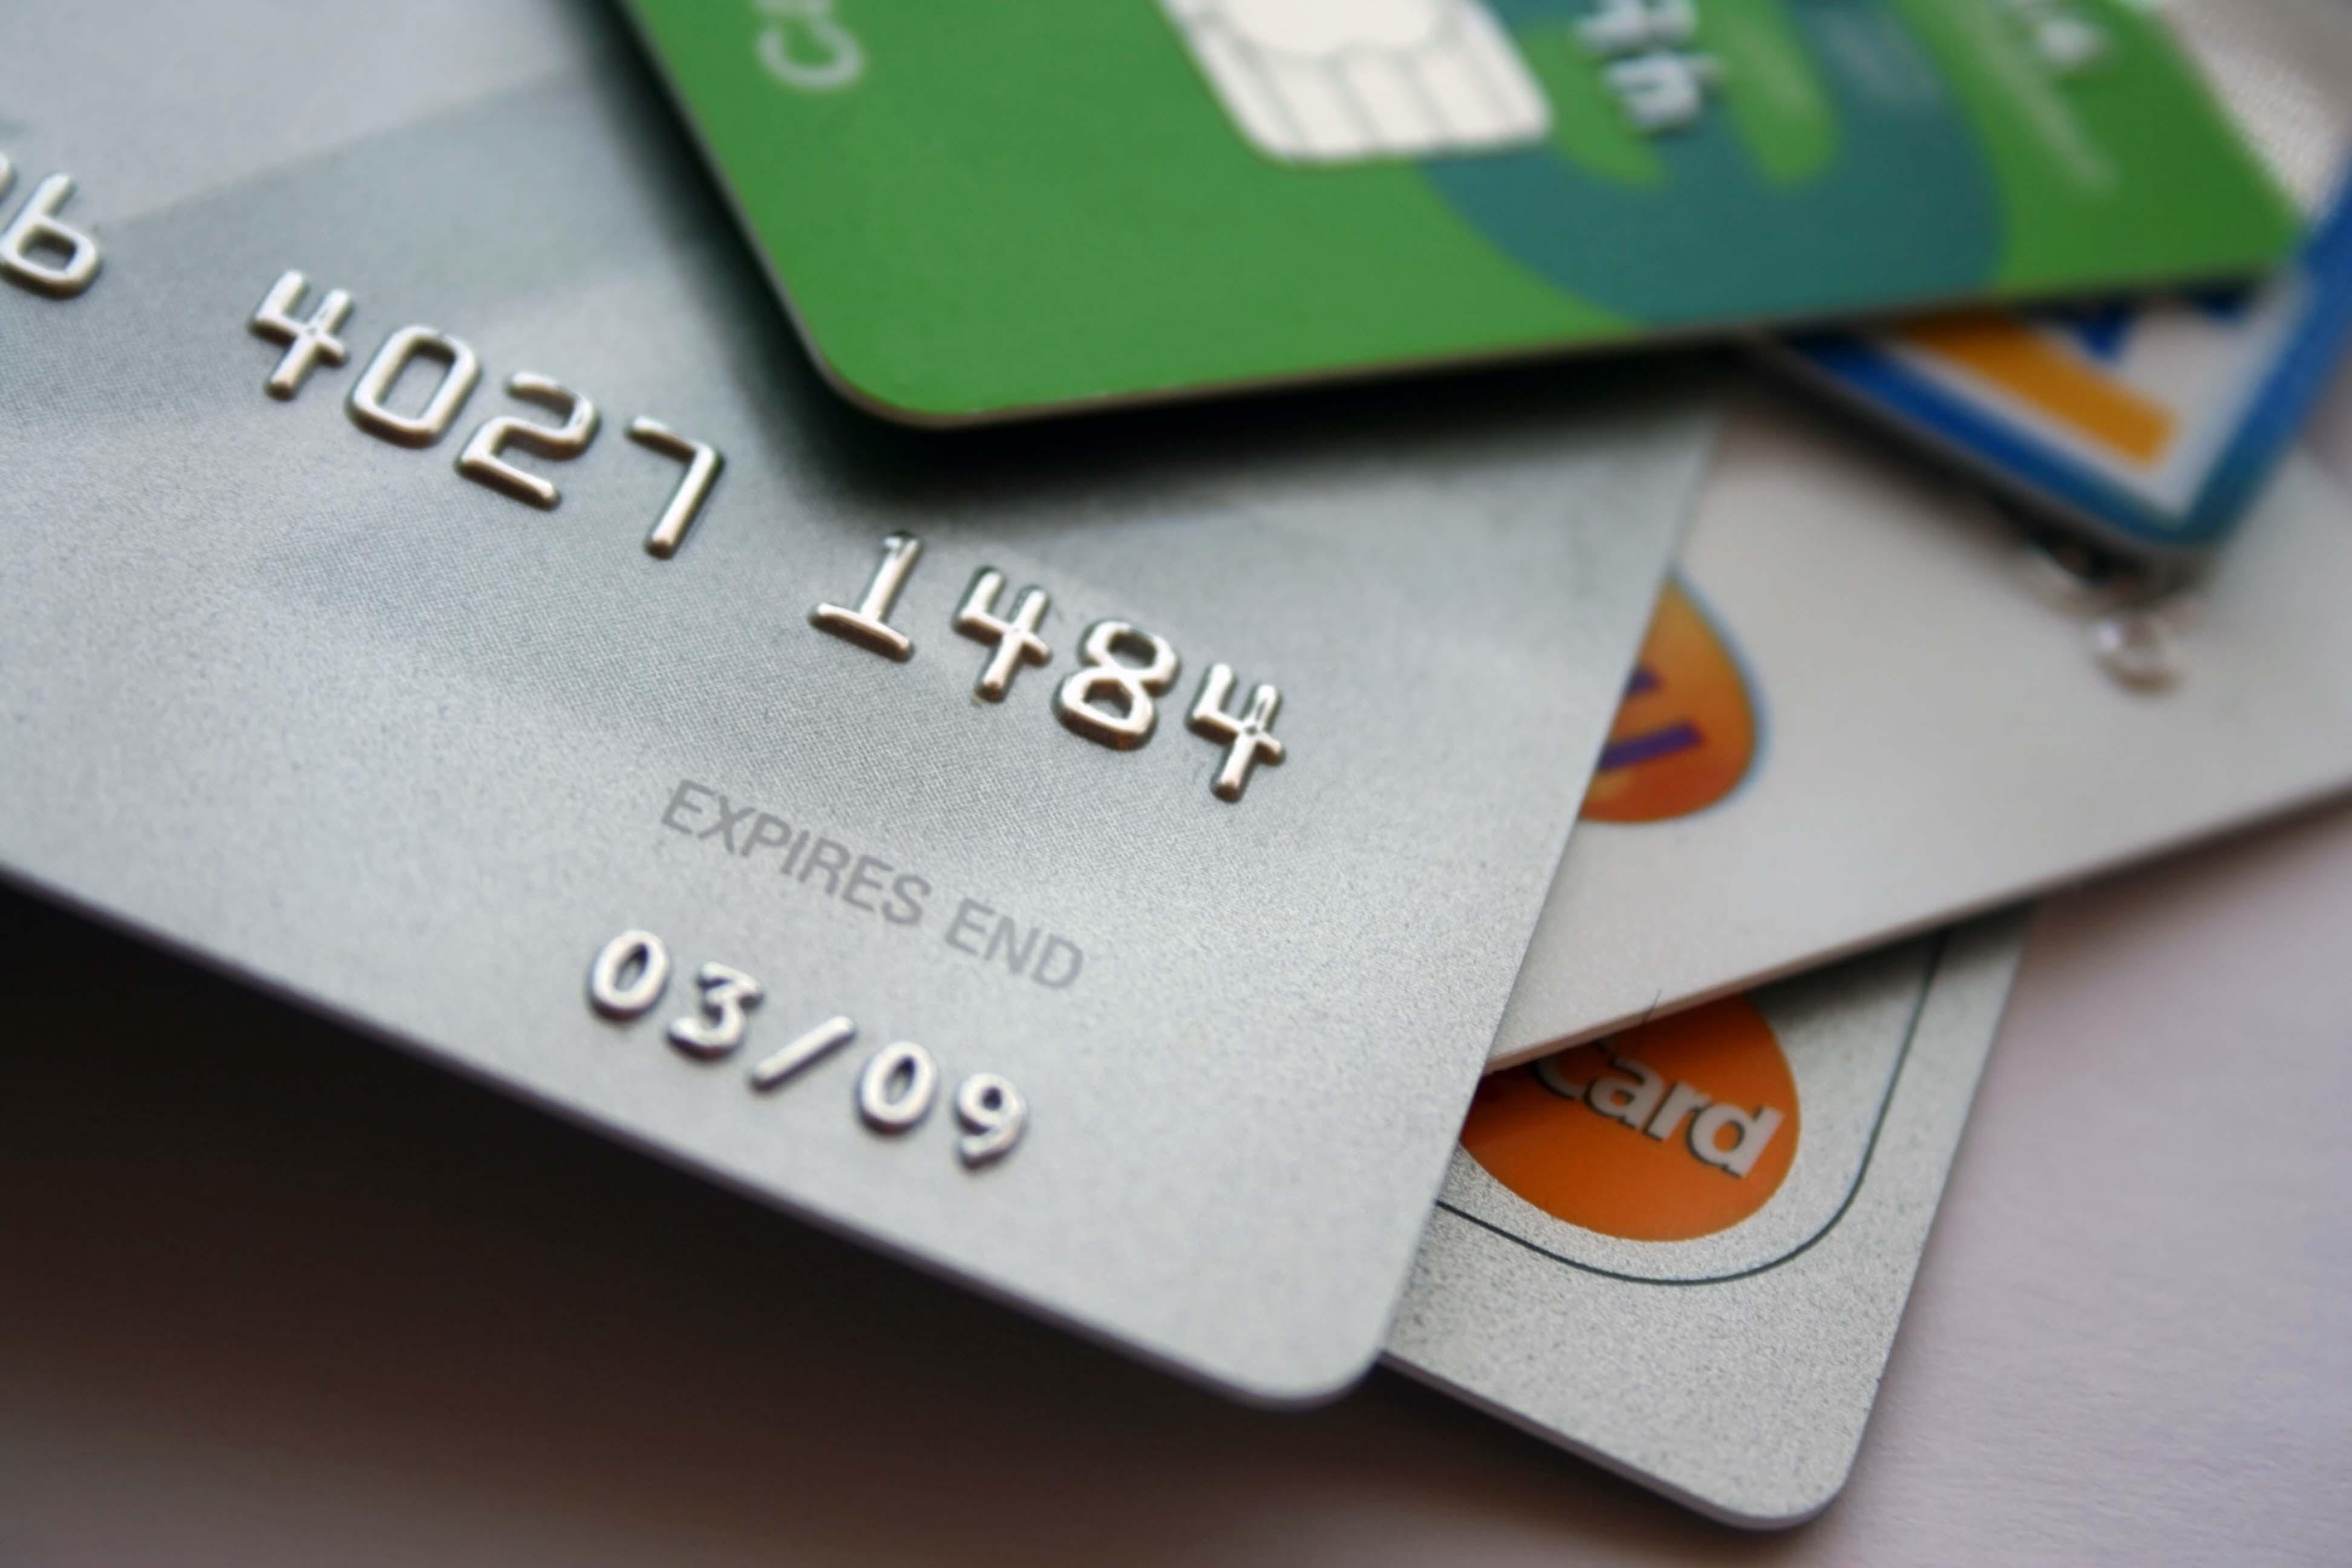 Boursorama En Voyage Et La Carte Visa Premier Attention